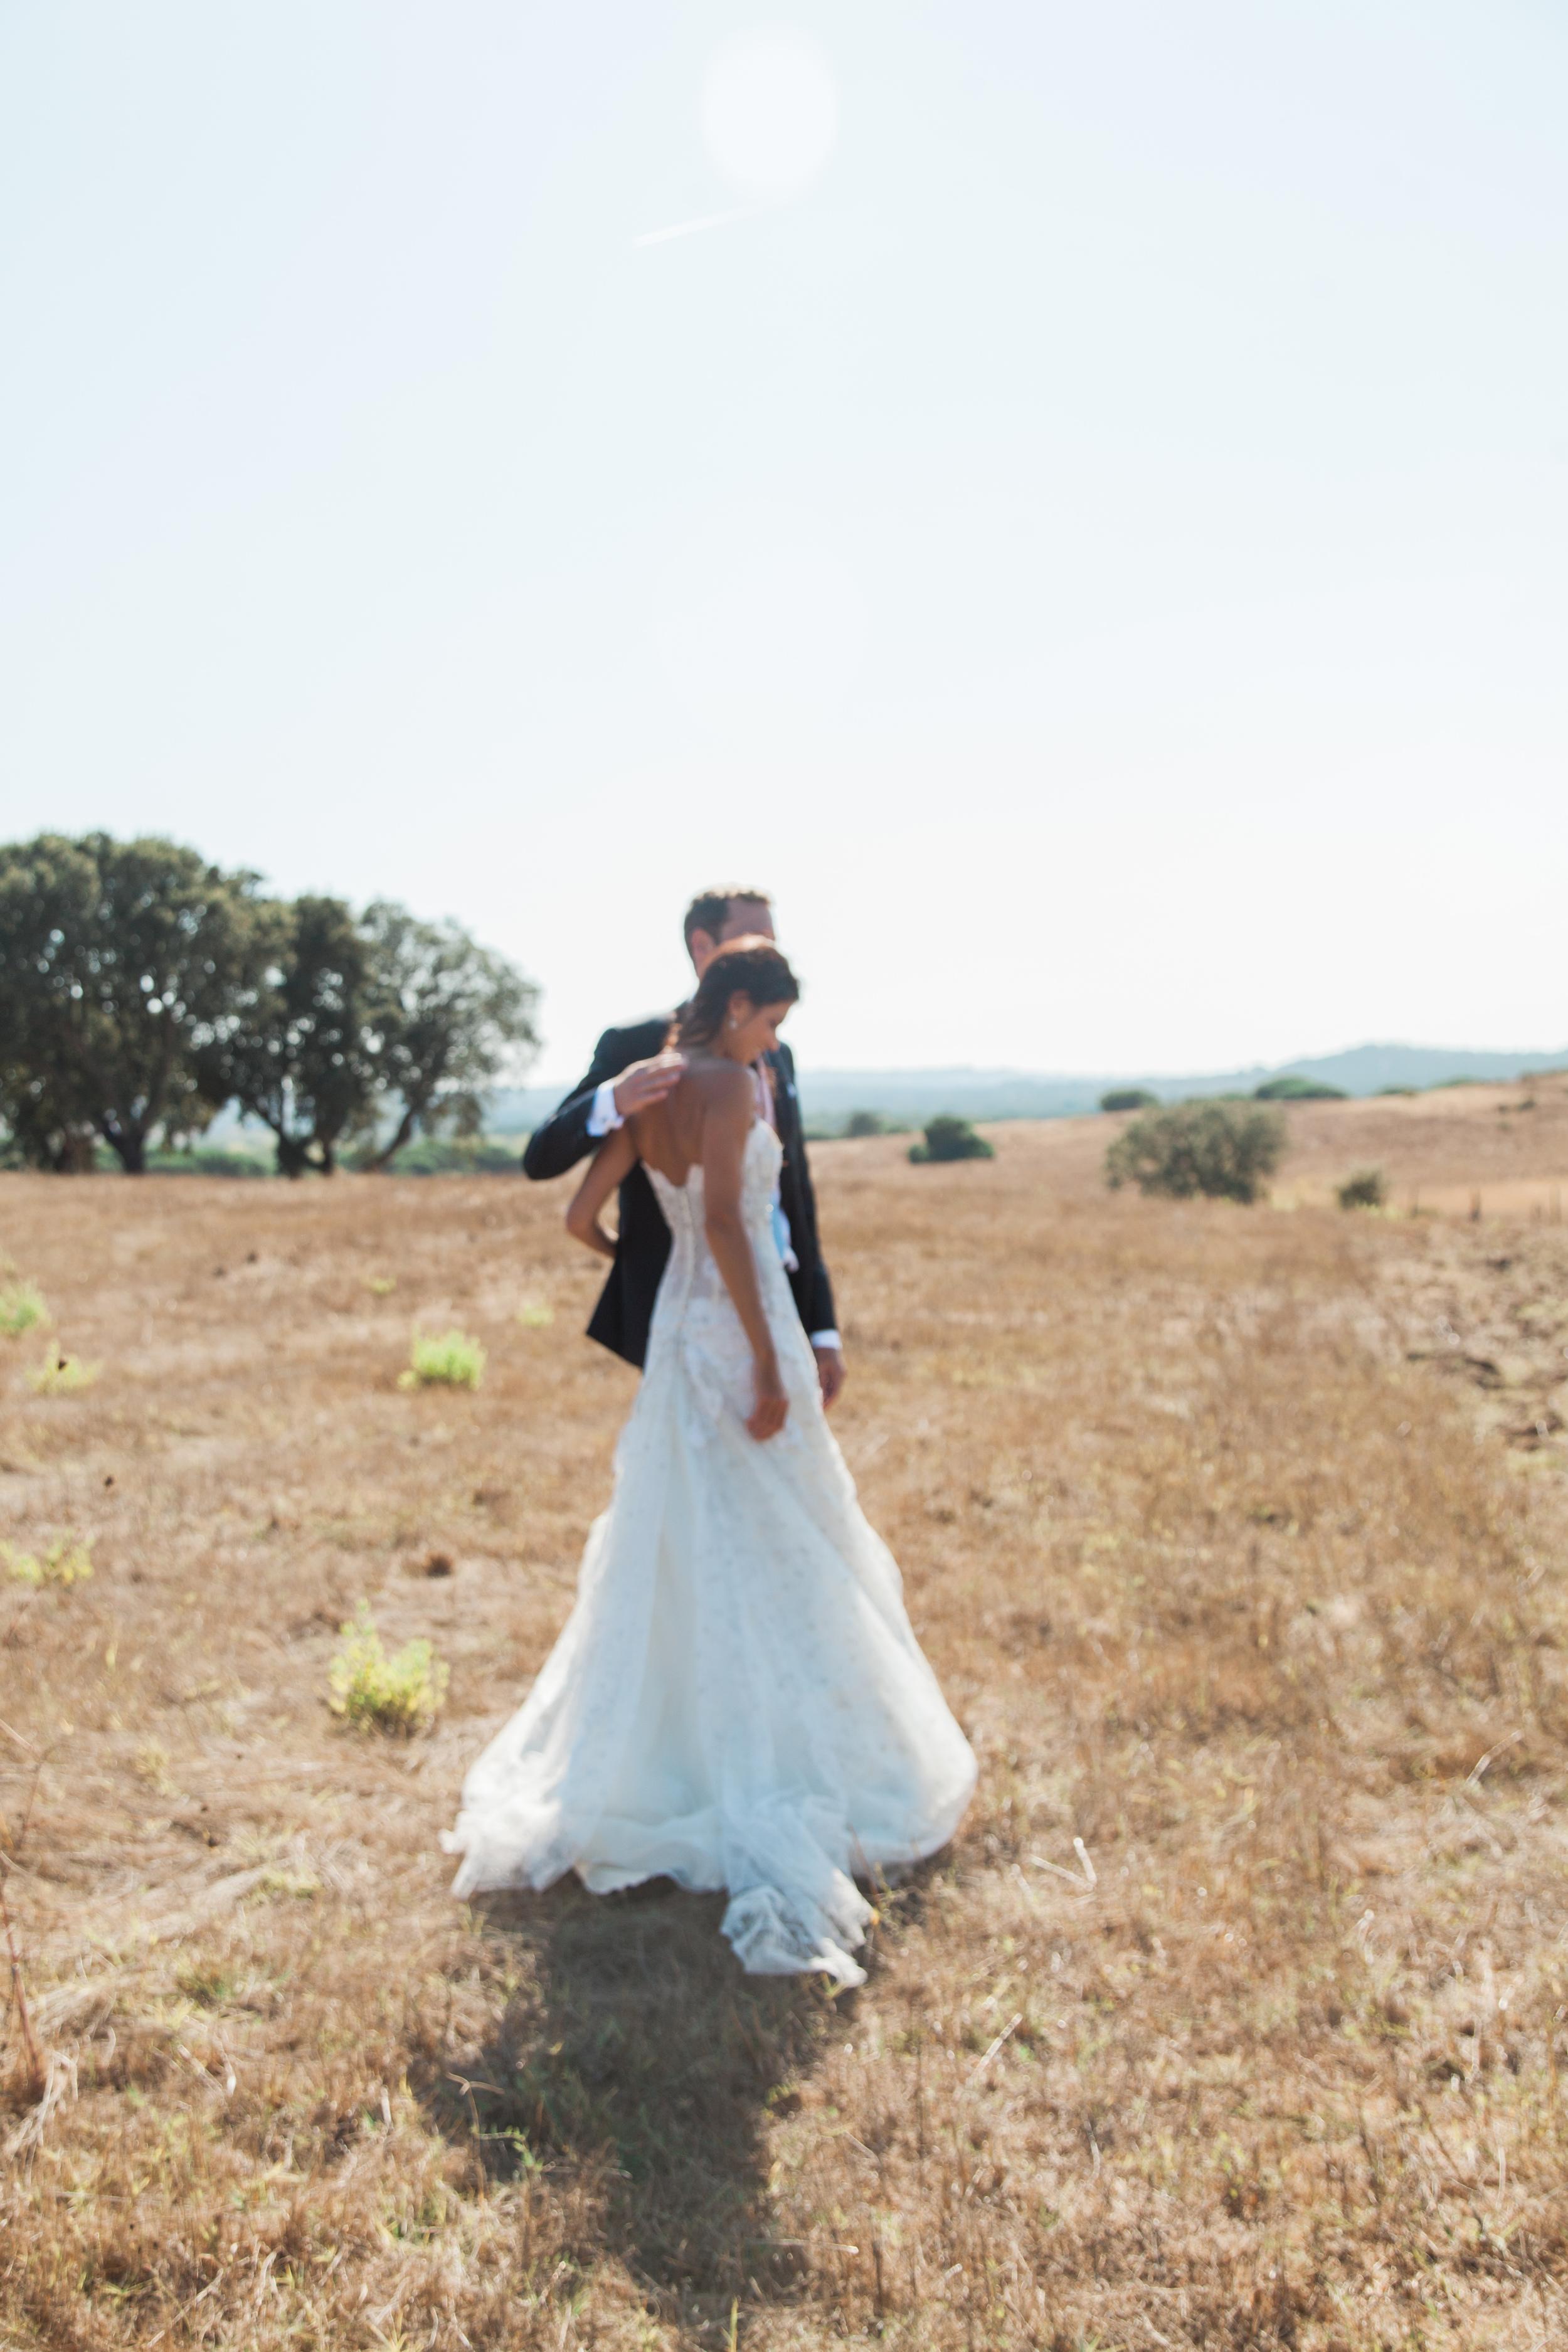 mariarao+wedding+quinta+del+carmen-400.jpg